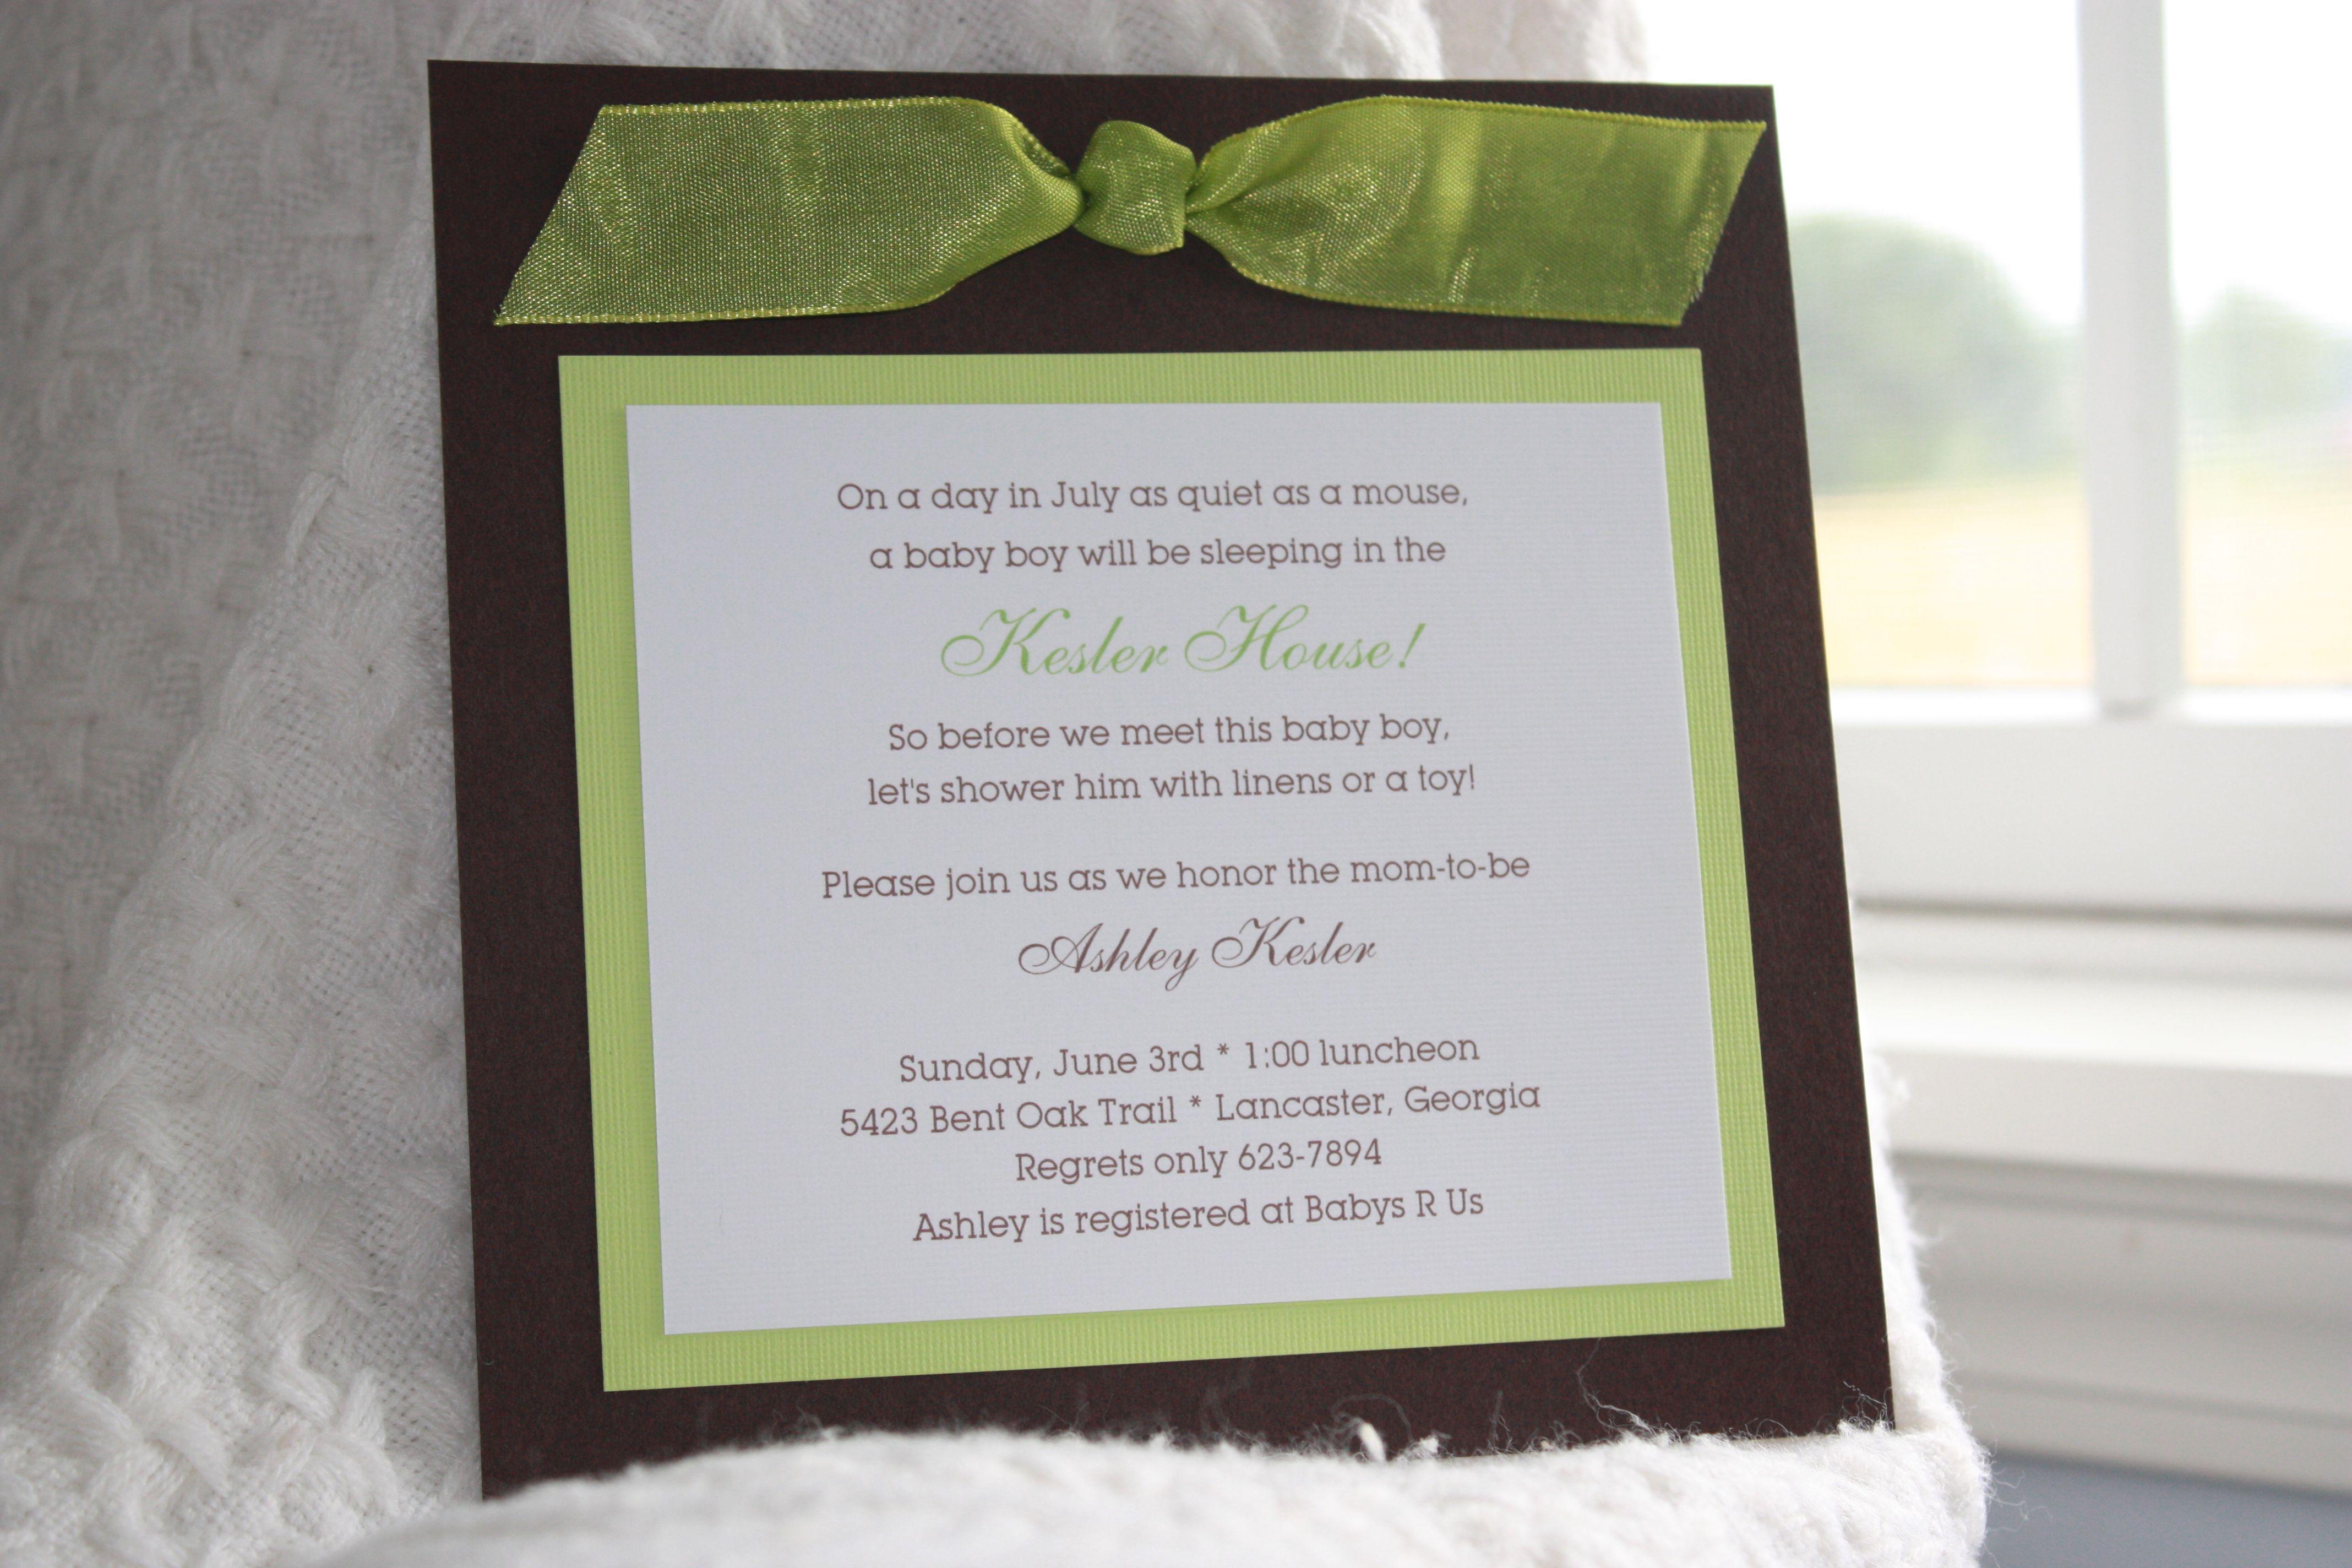 Diy bridal shower invitations homemade invitations baby shower6 diy bridal shower invitations homemade invitations baby shower6 boy solutioingenieria Choice Image